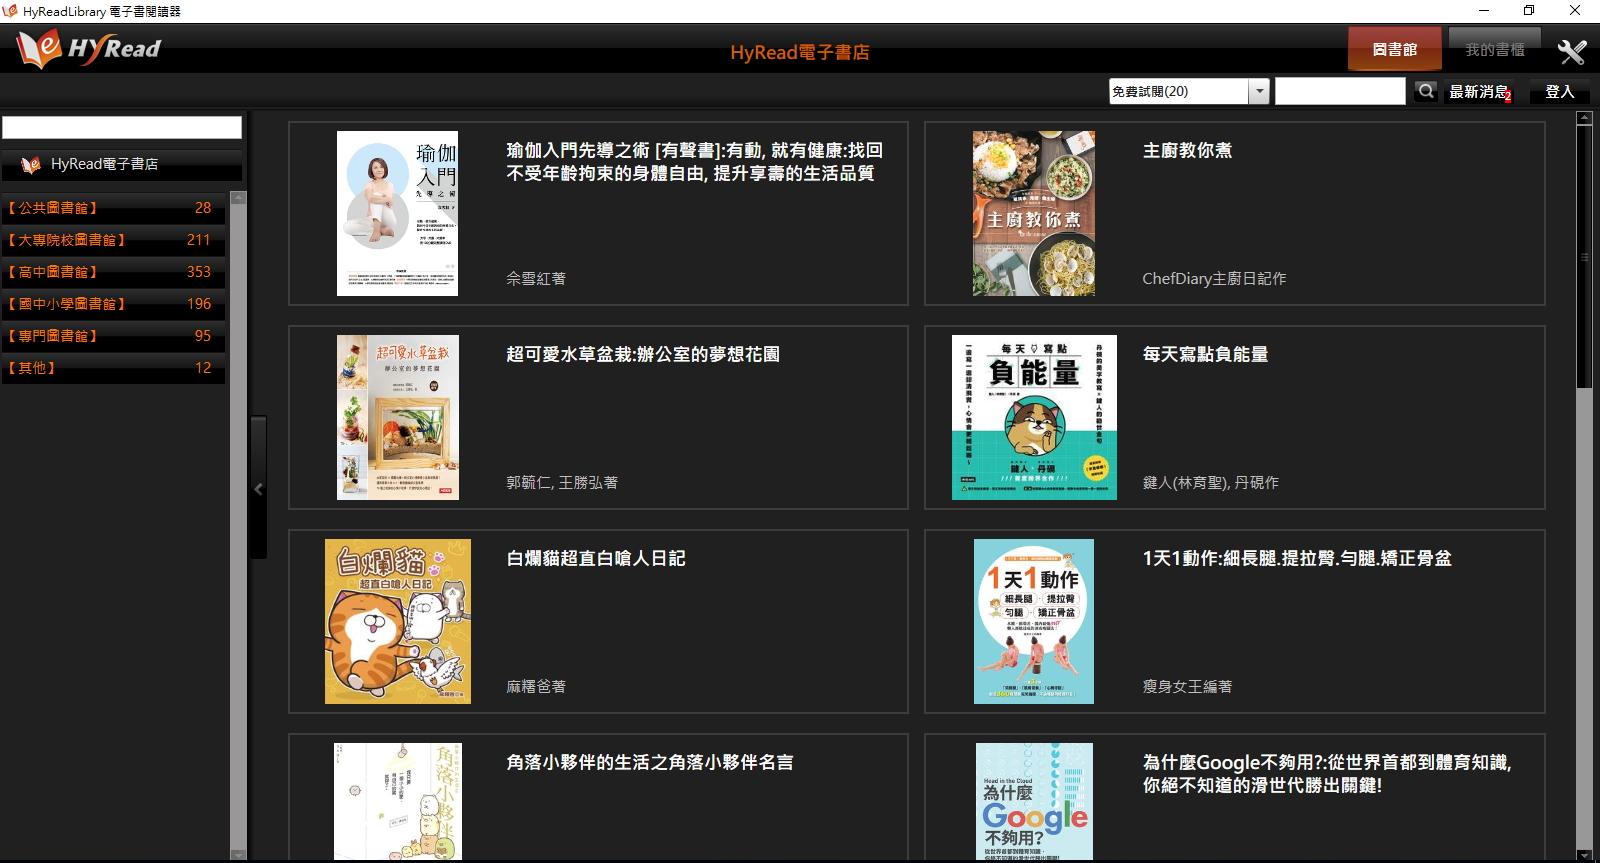 HyRead ebook 教你如何免費看6萬本電子書